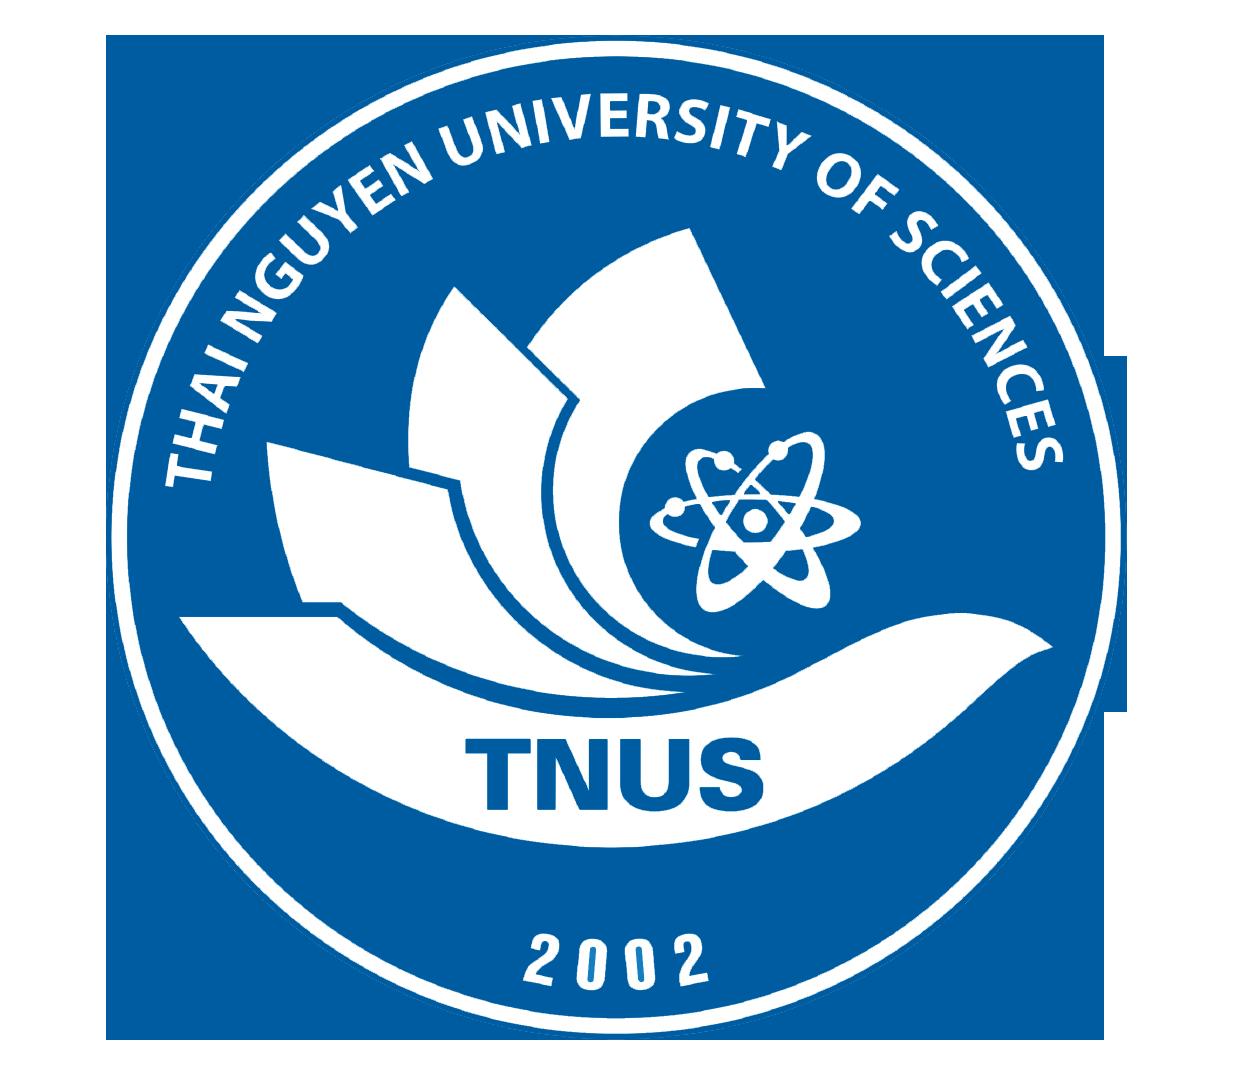 TNUS Logo with Slogan